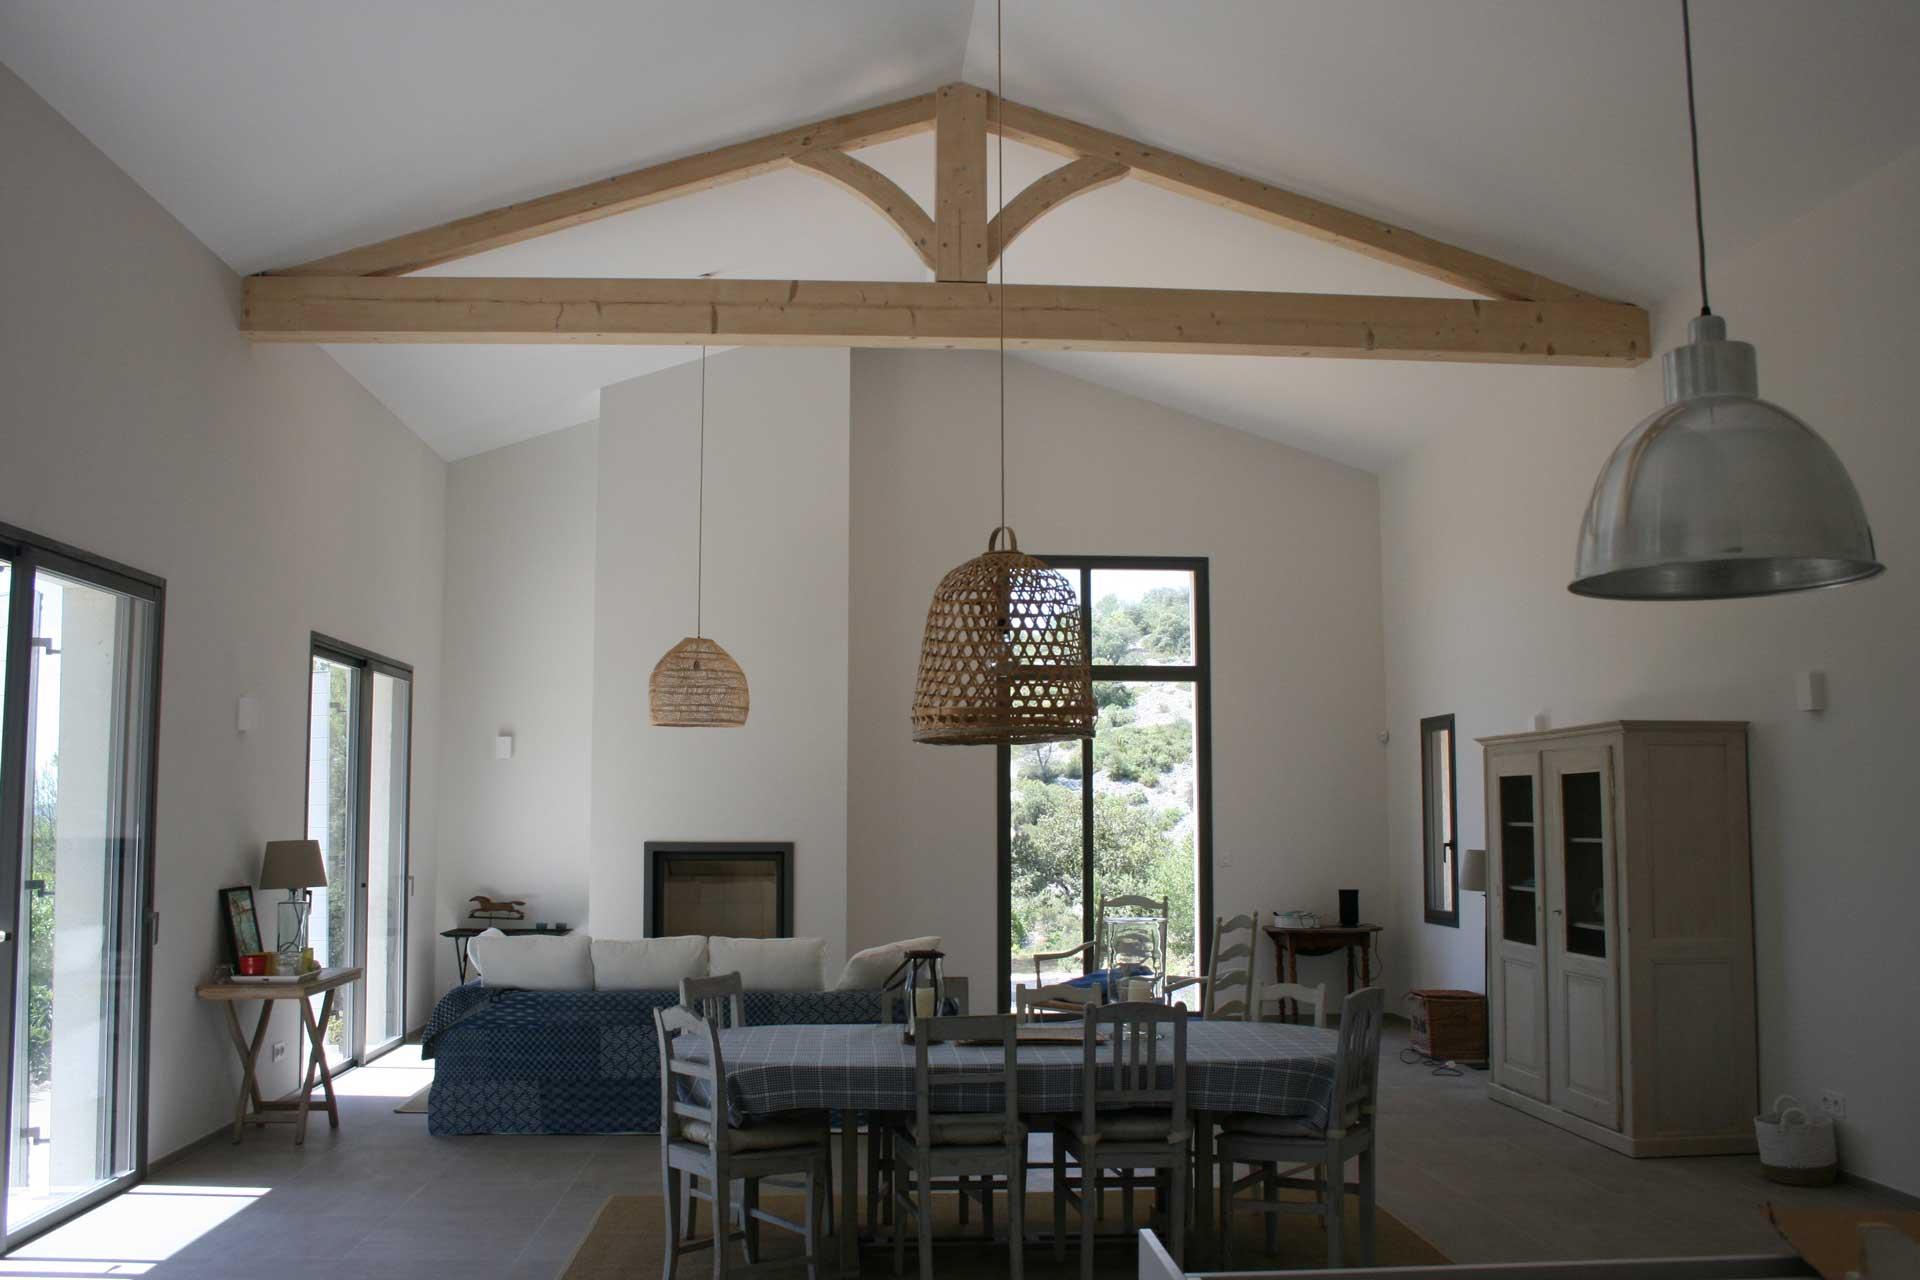 Rénovation par l'agence d'Architecture Brayer-Hugon